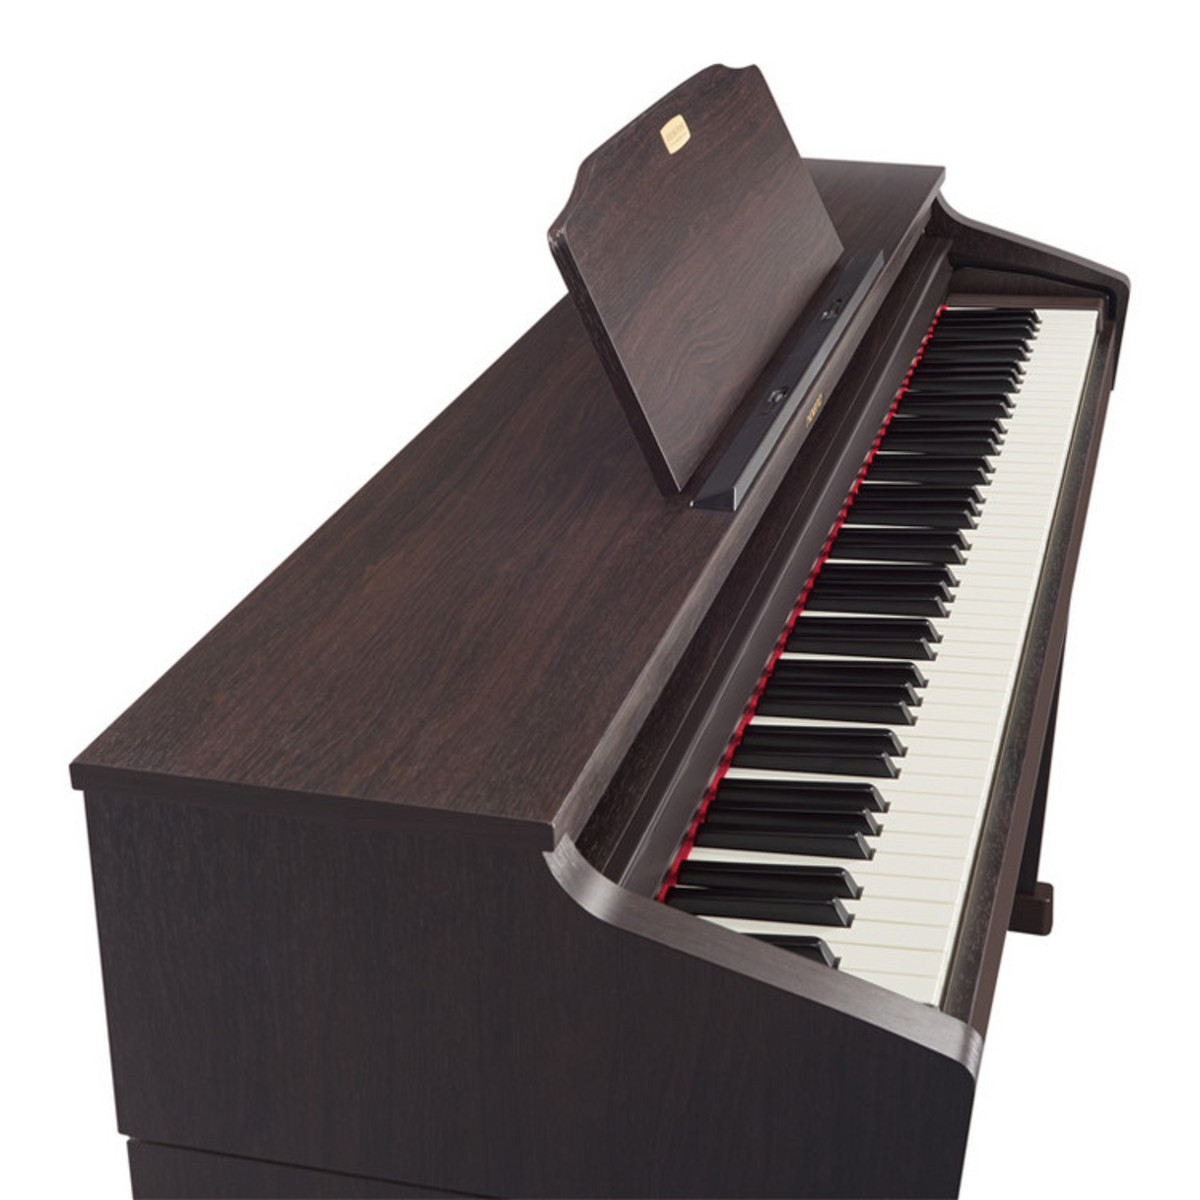 roland hp504 piano num rique palissandre. Black Bedroom Furniture Sets. Home Design Ideas